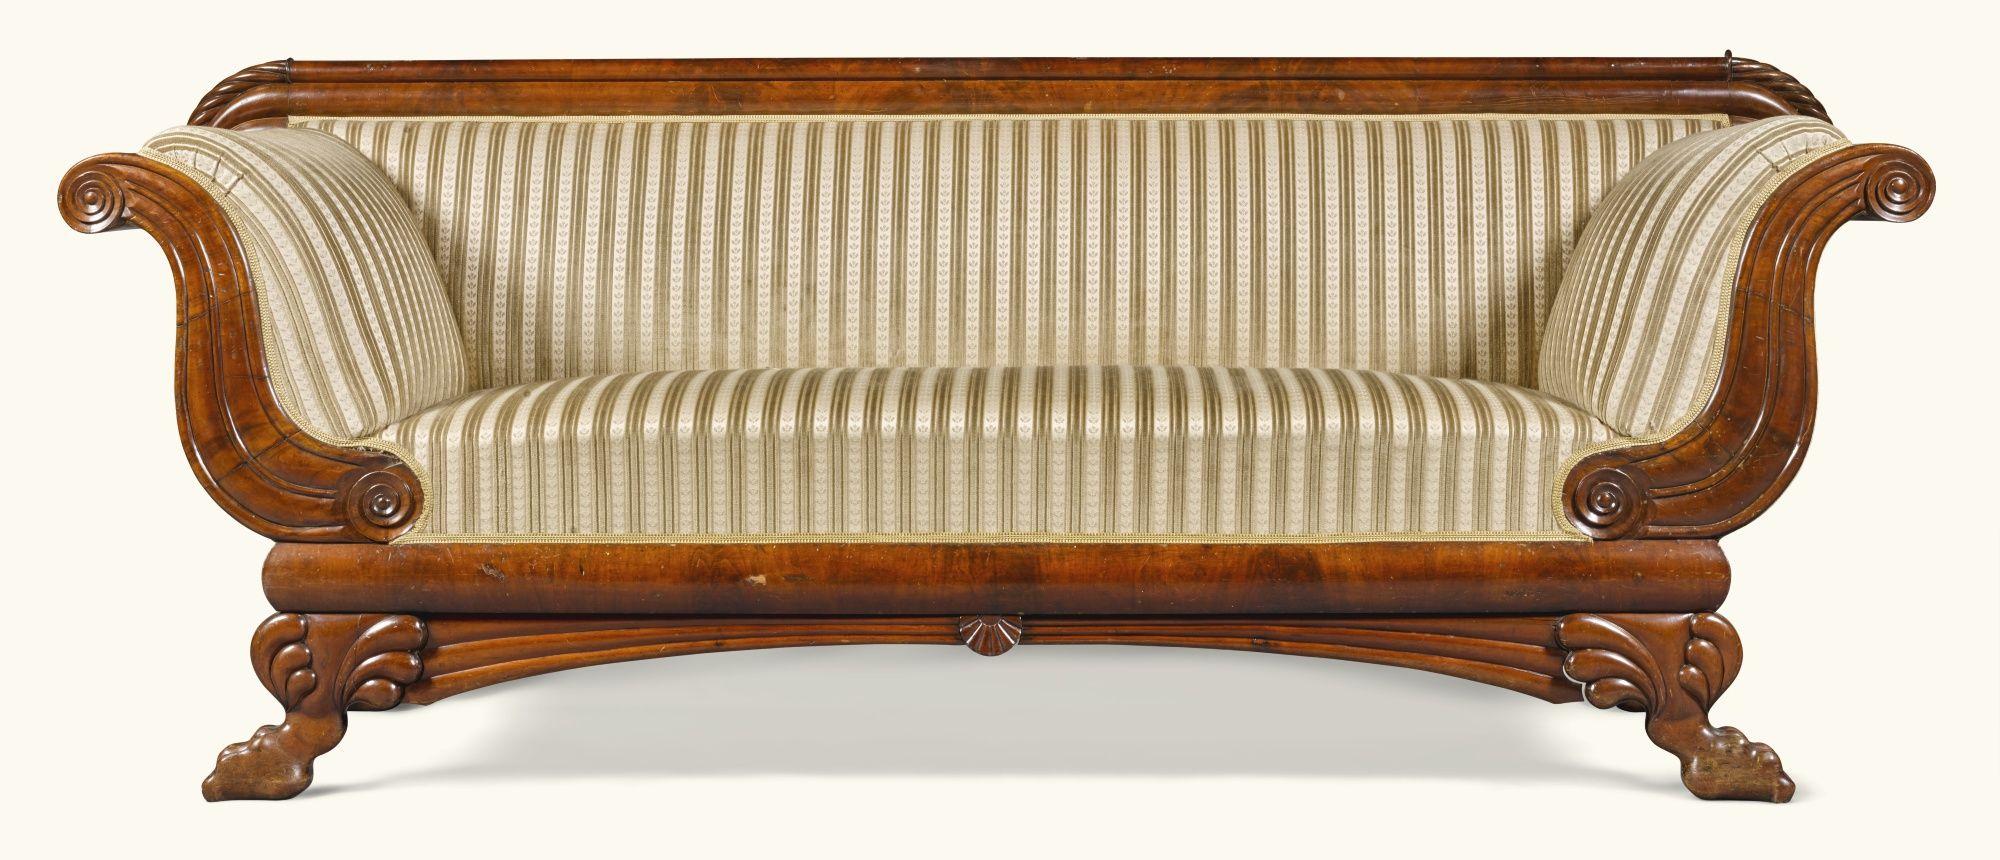 C1820 A North German Biedermeier Mahogany Sofa Circa 1820 Estimate 1 500 2 000 Gbp 1 841 2 454us Biedermeier Furniture Wooden Sofa Wooden Sofa Designs